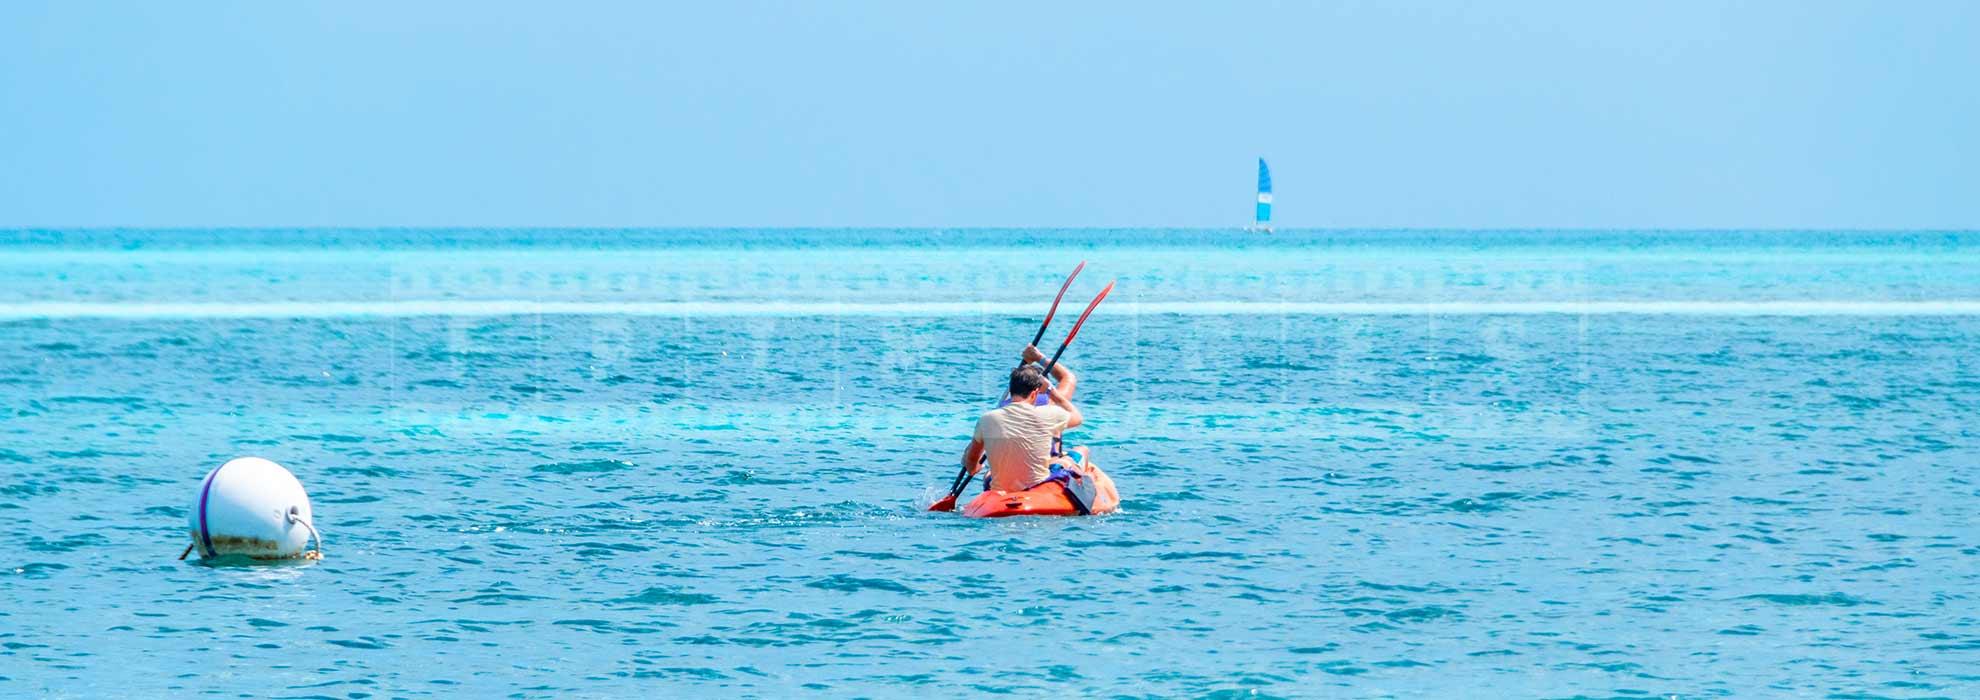 People enjoying kayak at Iberostar Daiquiri beach cuba